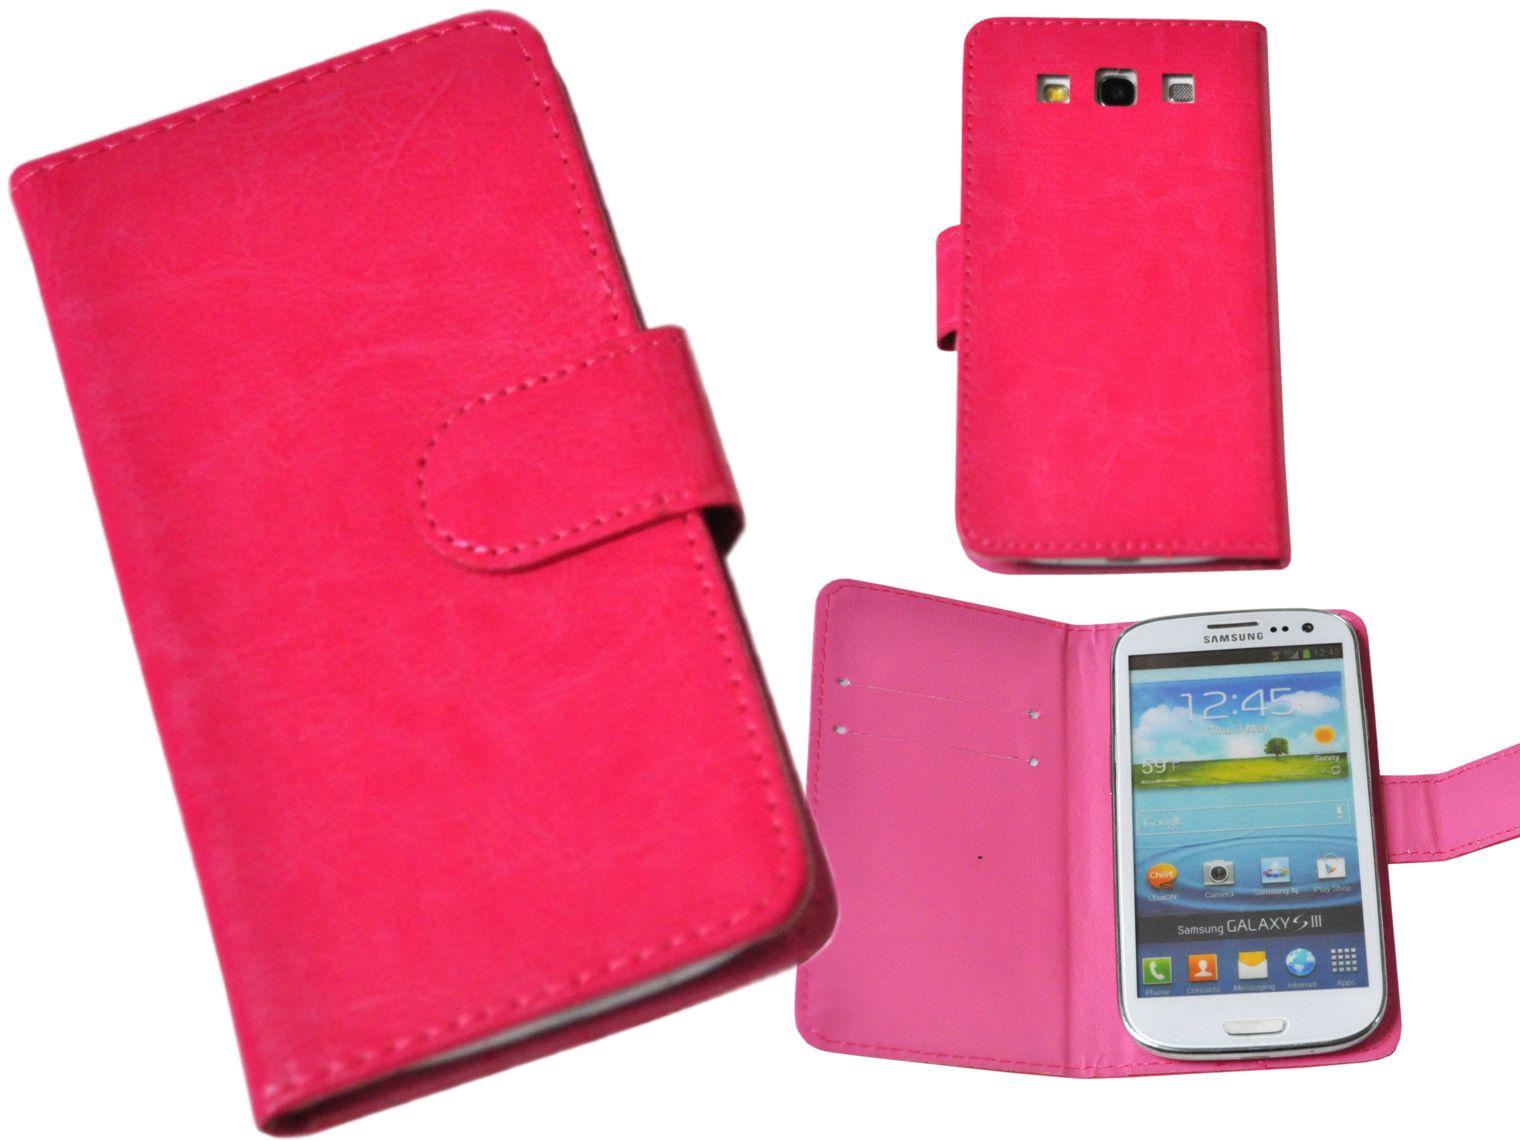 ccbb883c810e2 Etui rozkładane portfel Samsung Galaxy On8 book - 7113732425 - oficjalne  archiwum allegro